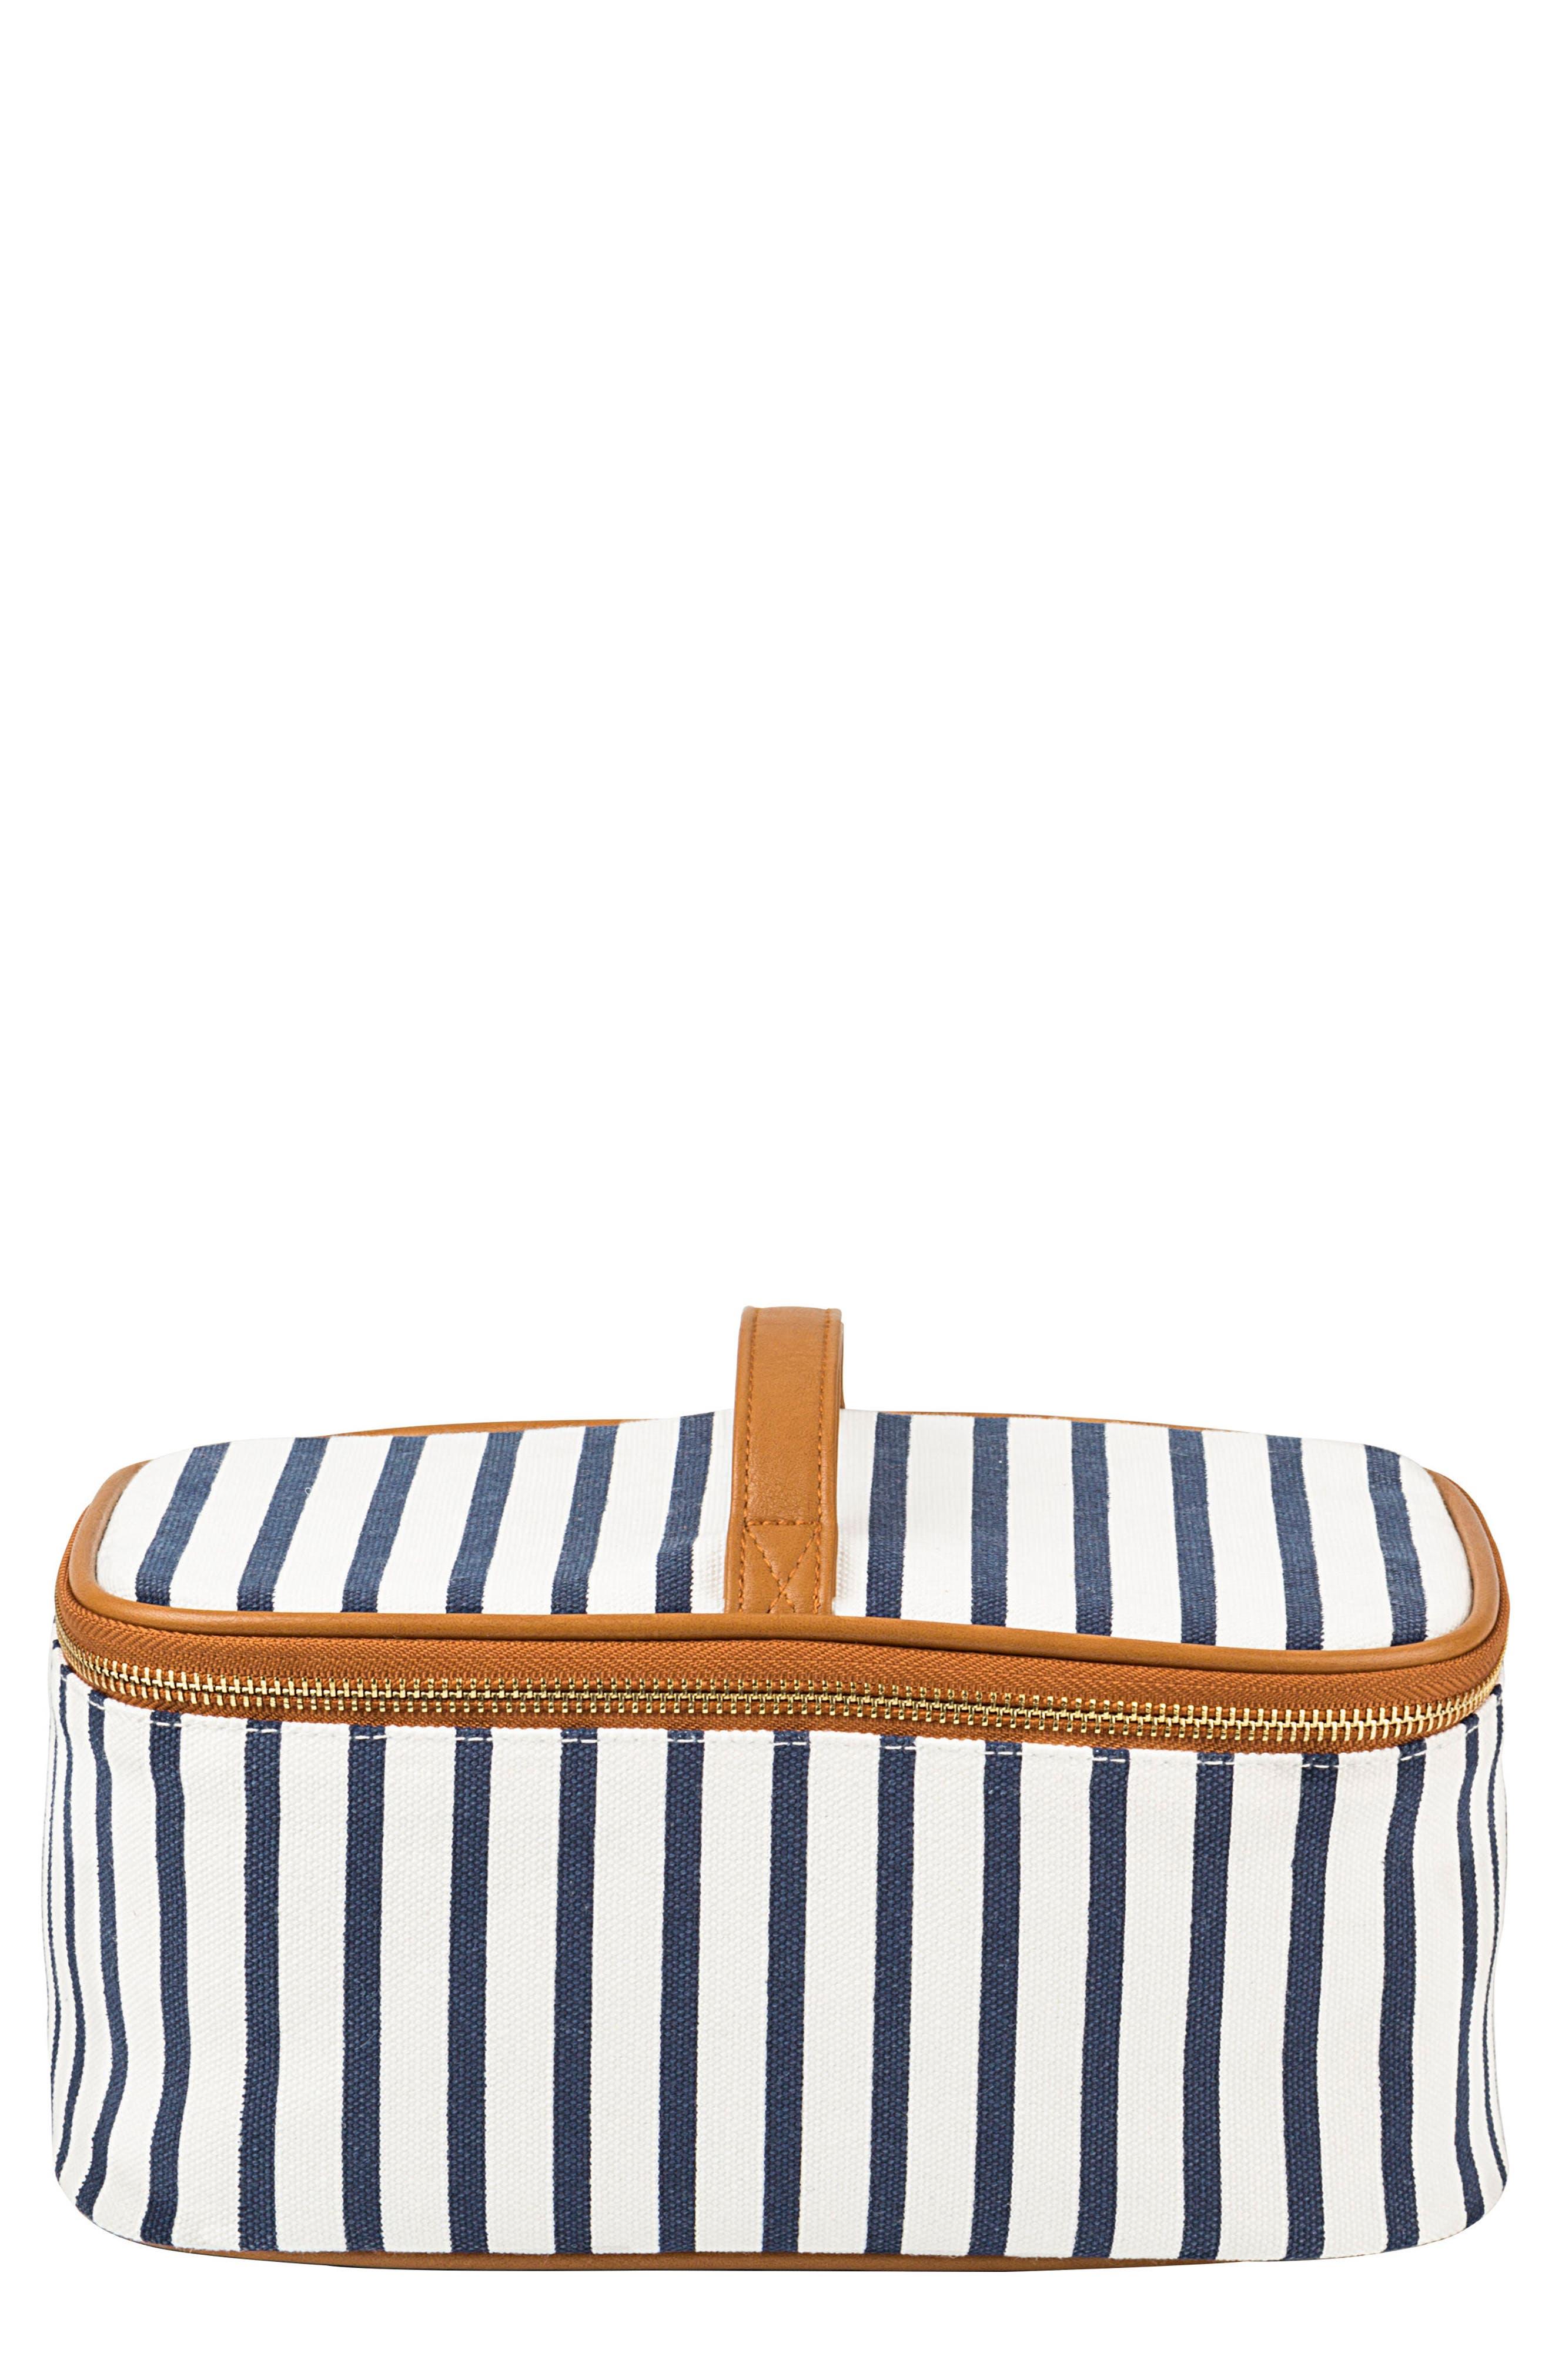 Monogram Stripe Canvas Cosmetics Case,                         Main,                         color, BLUE